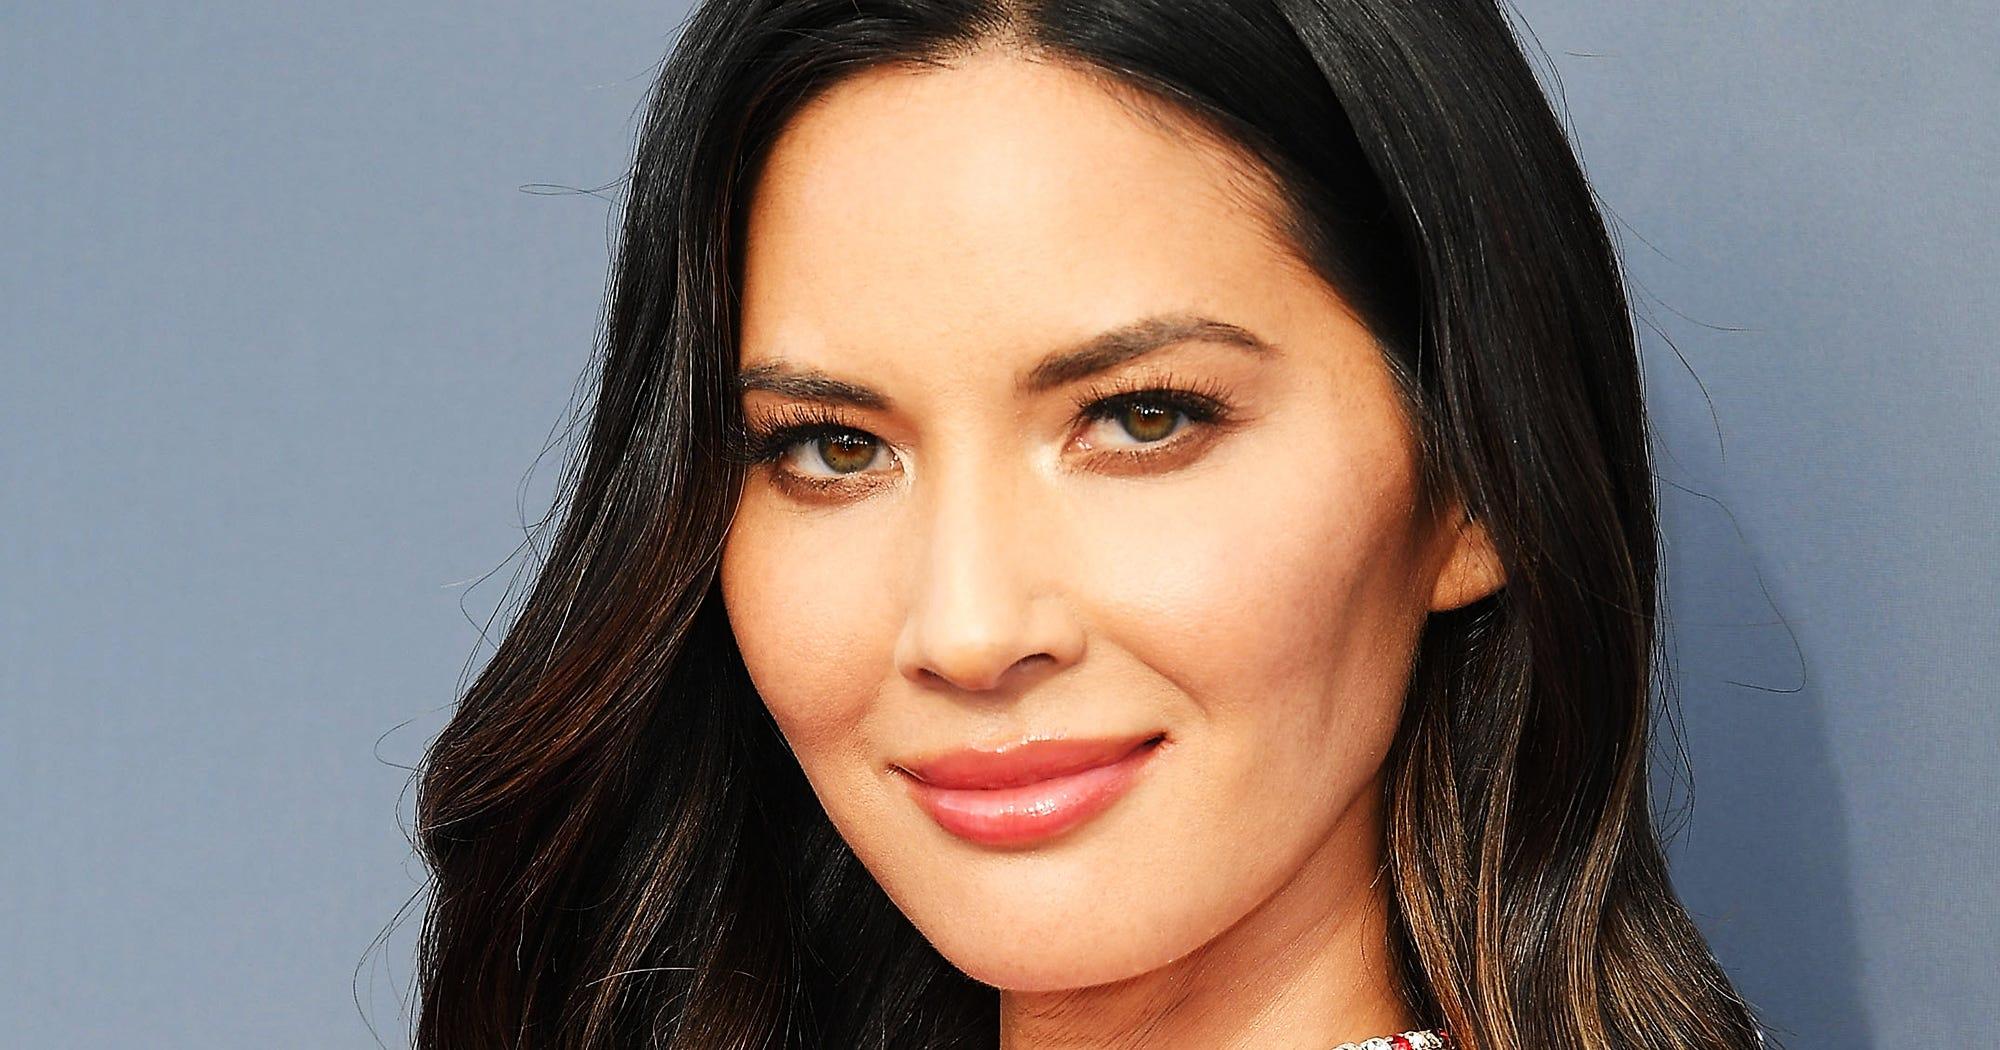 Olivia Munn Calls Out Mark Wahlberg's Egregious Salary